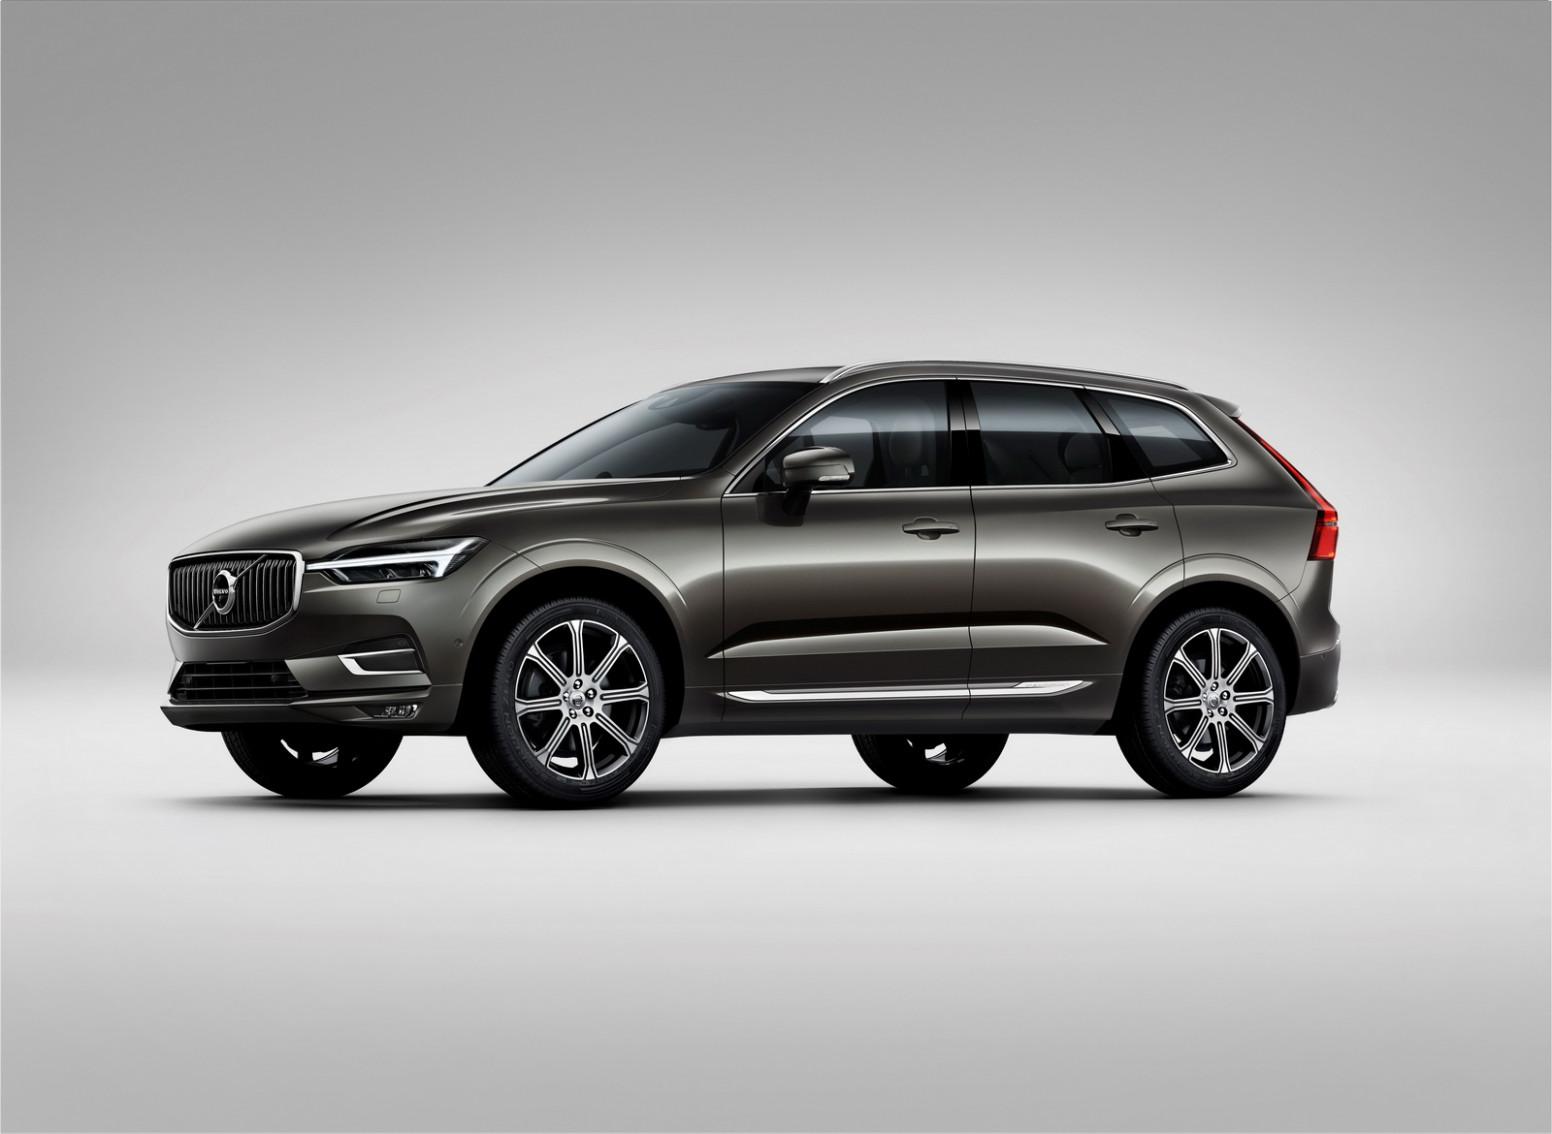 Rumors 2022 Volvo XC60